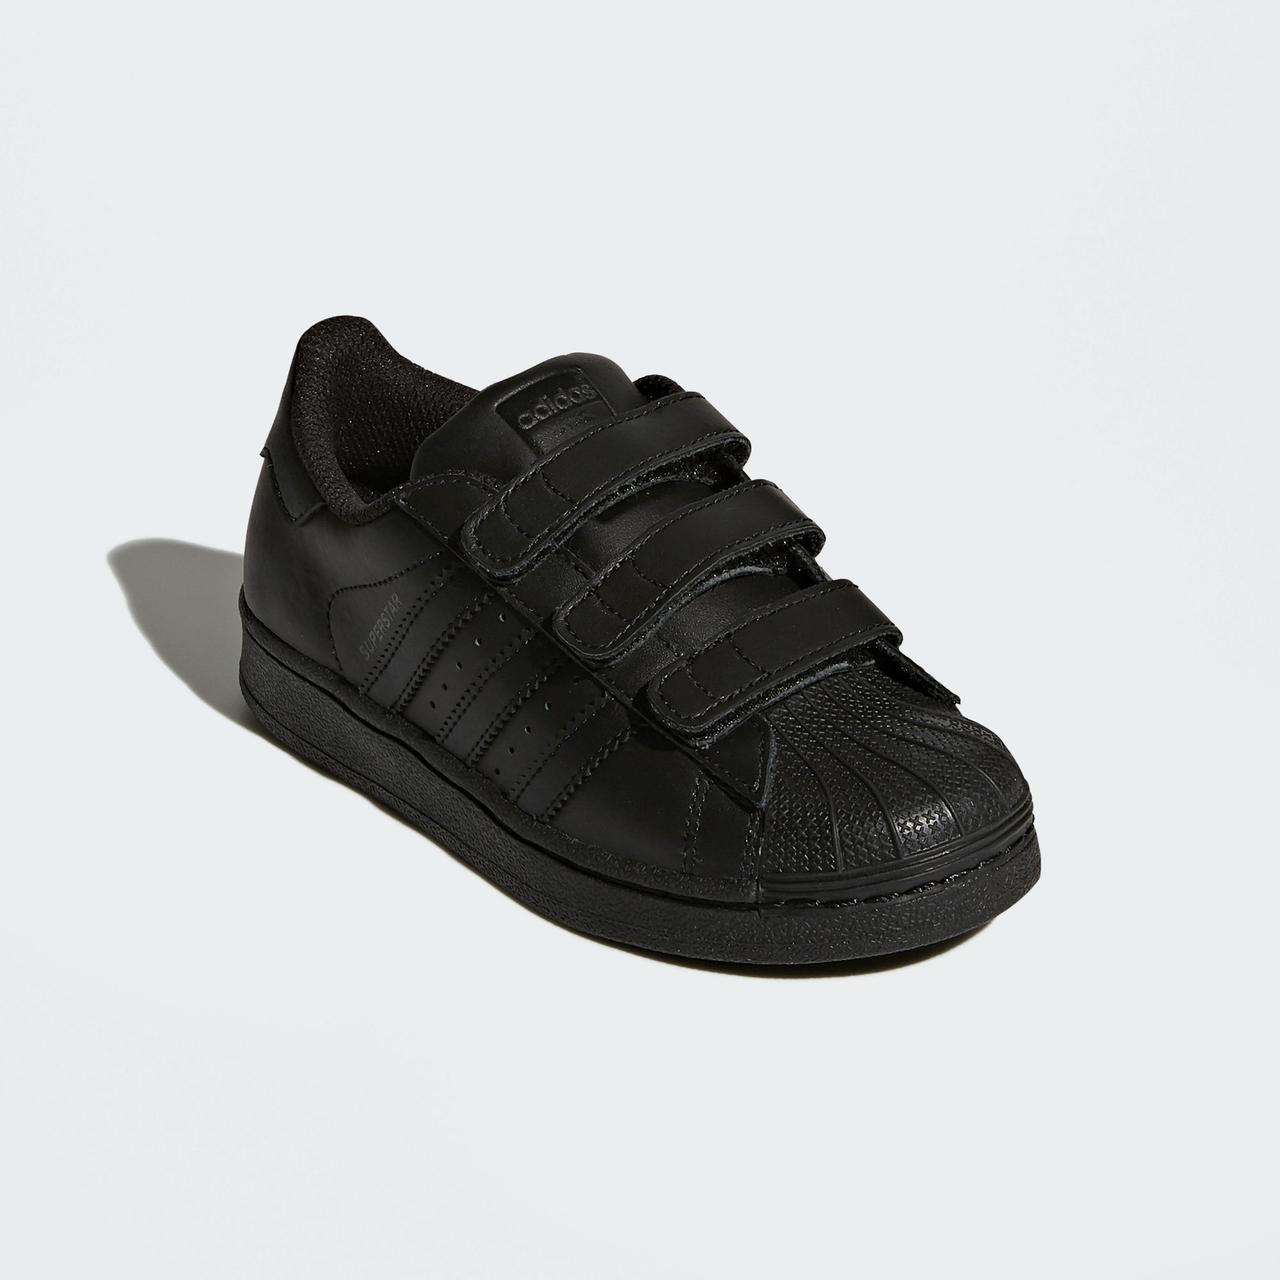 c0968237 ... Детские кроссовки Adidas Originals Superstar Foundation (Артикул:  B25728), ...